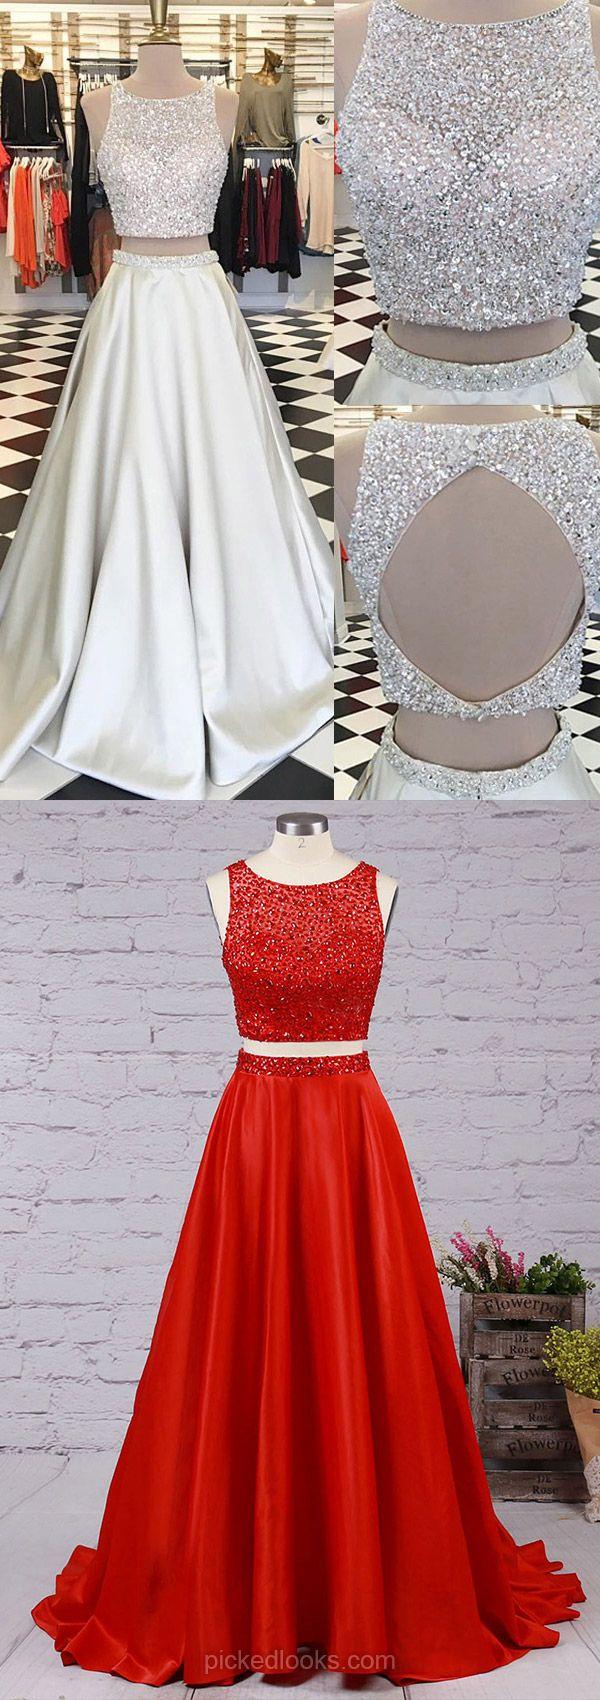 Long Ball Dresses Cheap, White Prom Dresses 2018, A line Evening Dresses Satin, Modest Graduation Dresses for Teens